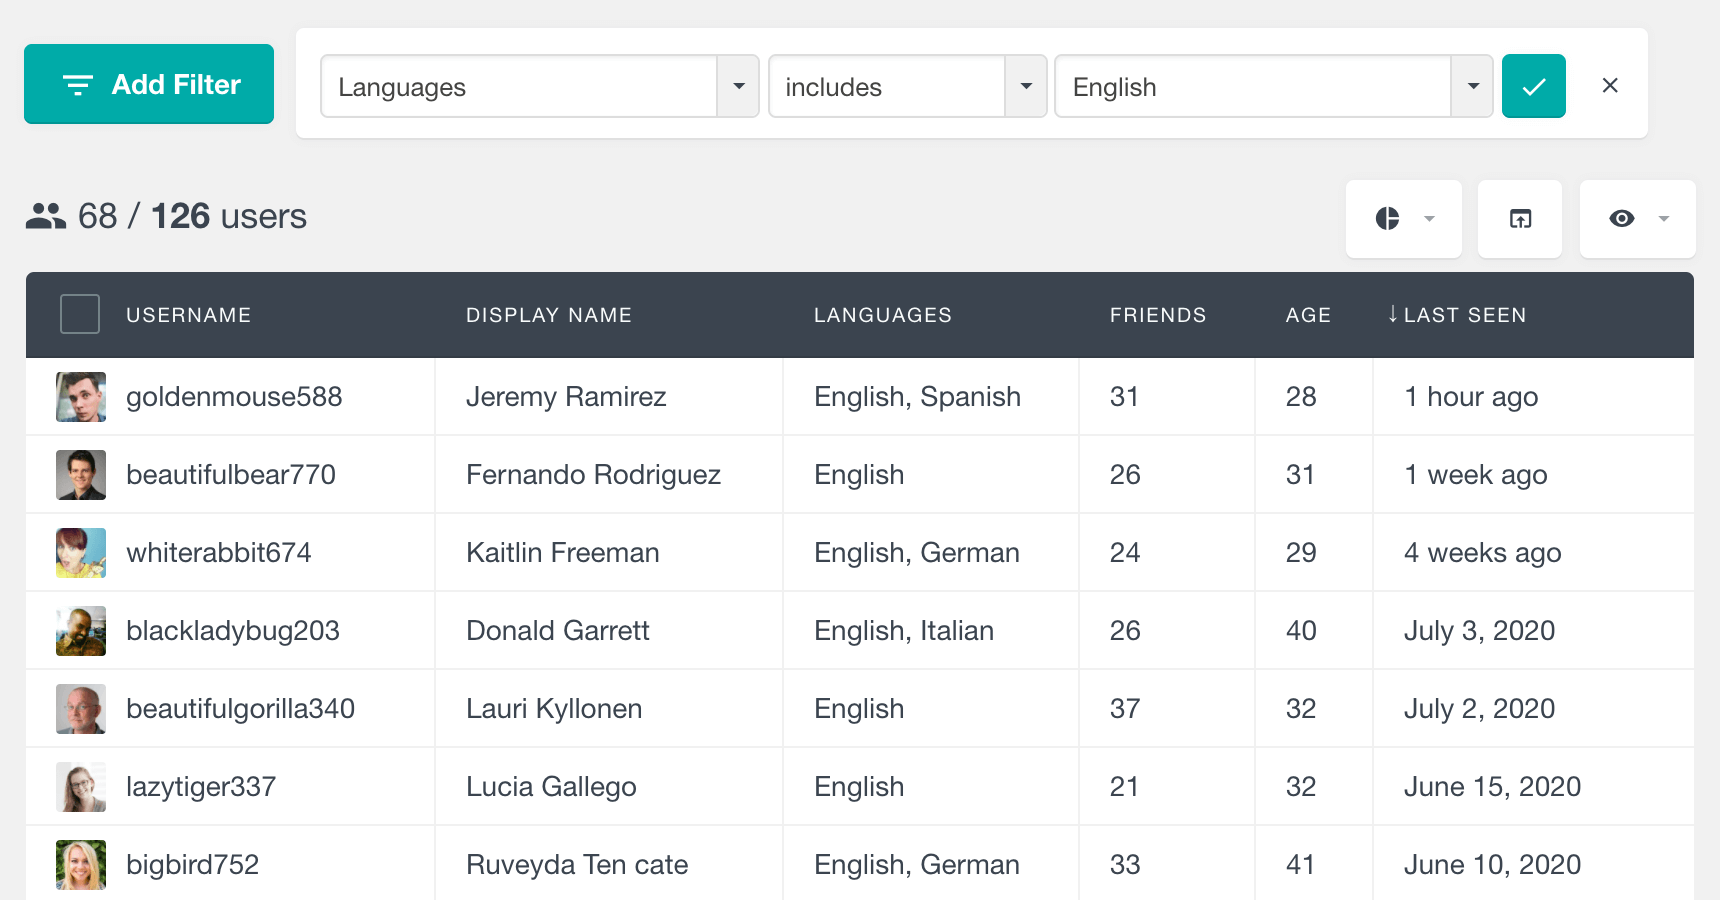 BuddyPress filter users by xprofile checkox field